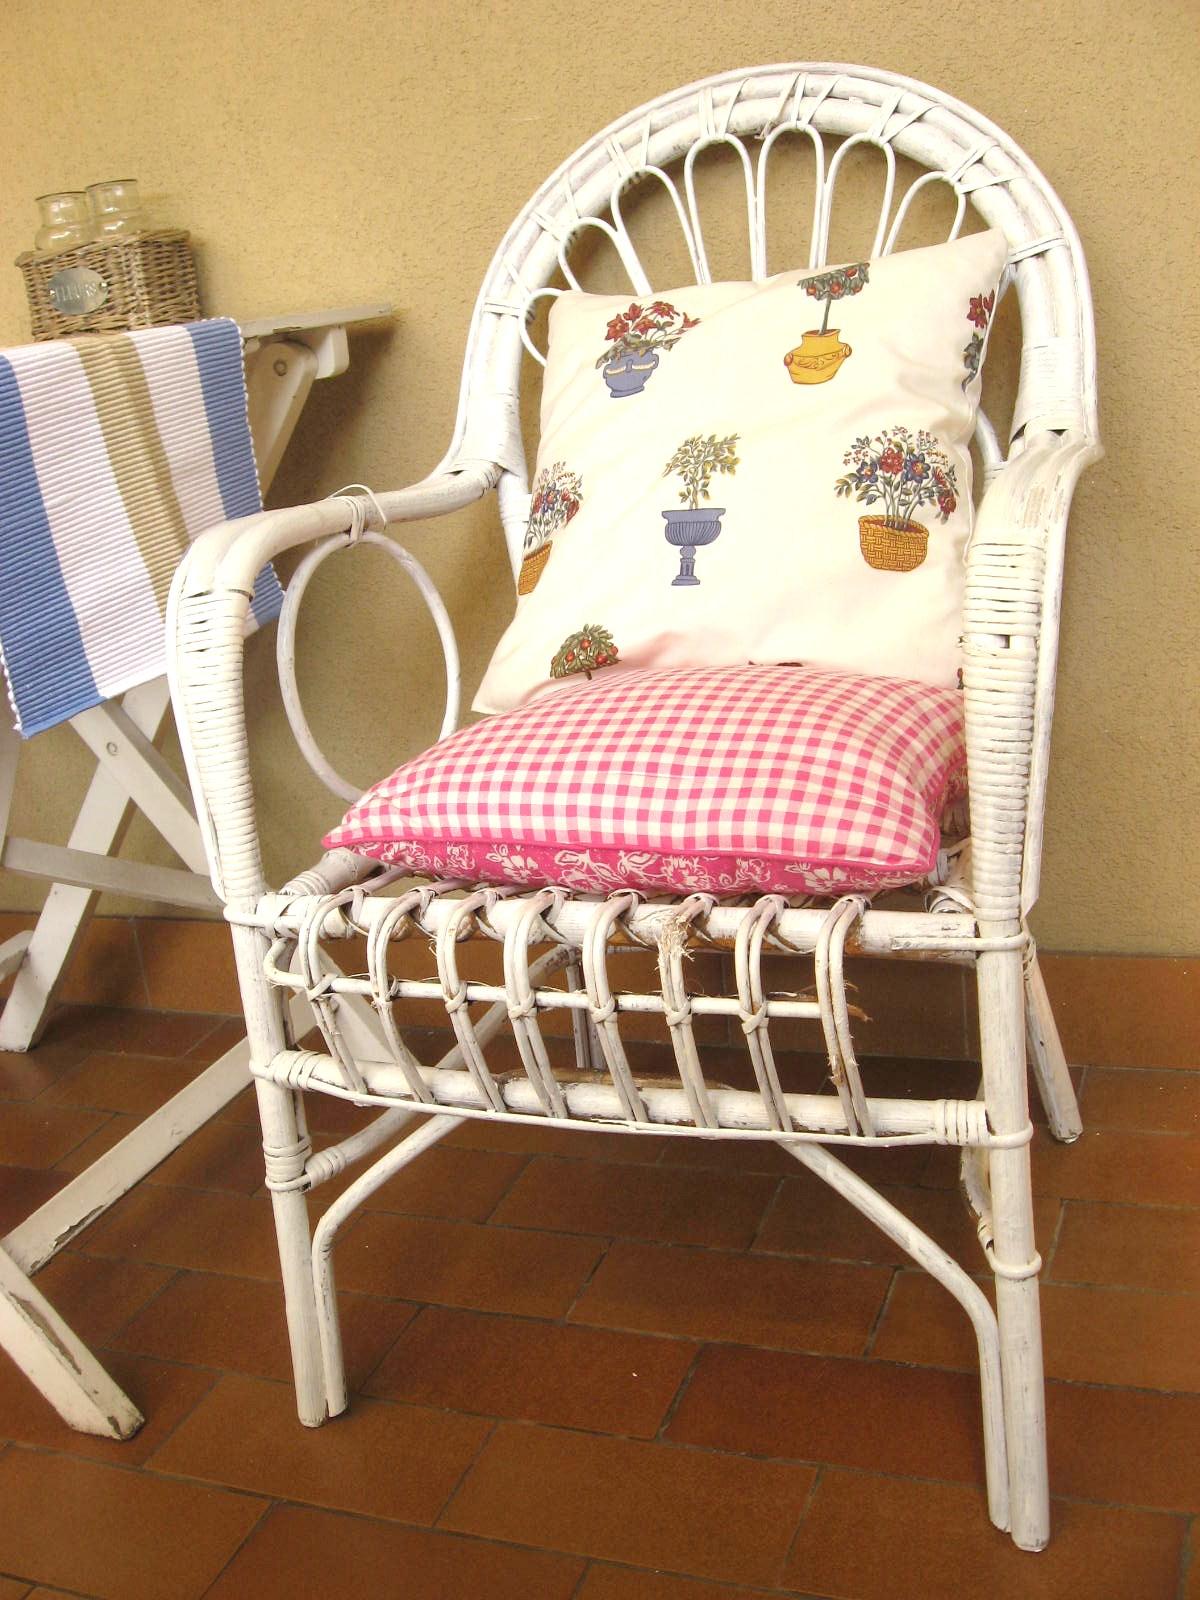 Il patchwork di penny sedie di vimini rinnovate - Sedie in vimini ikea ...